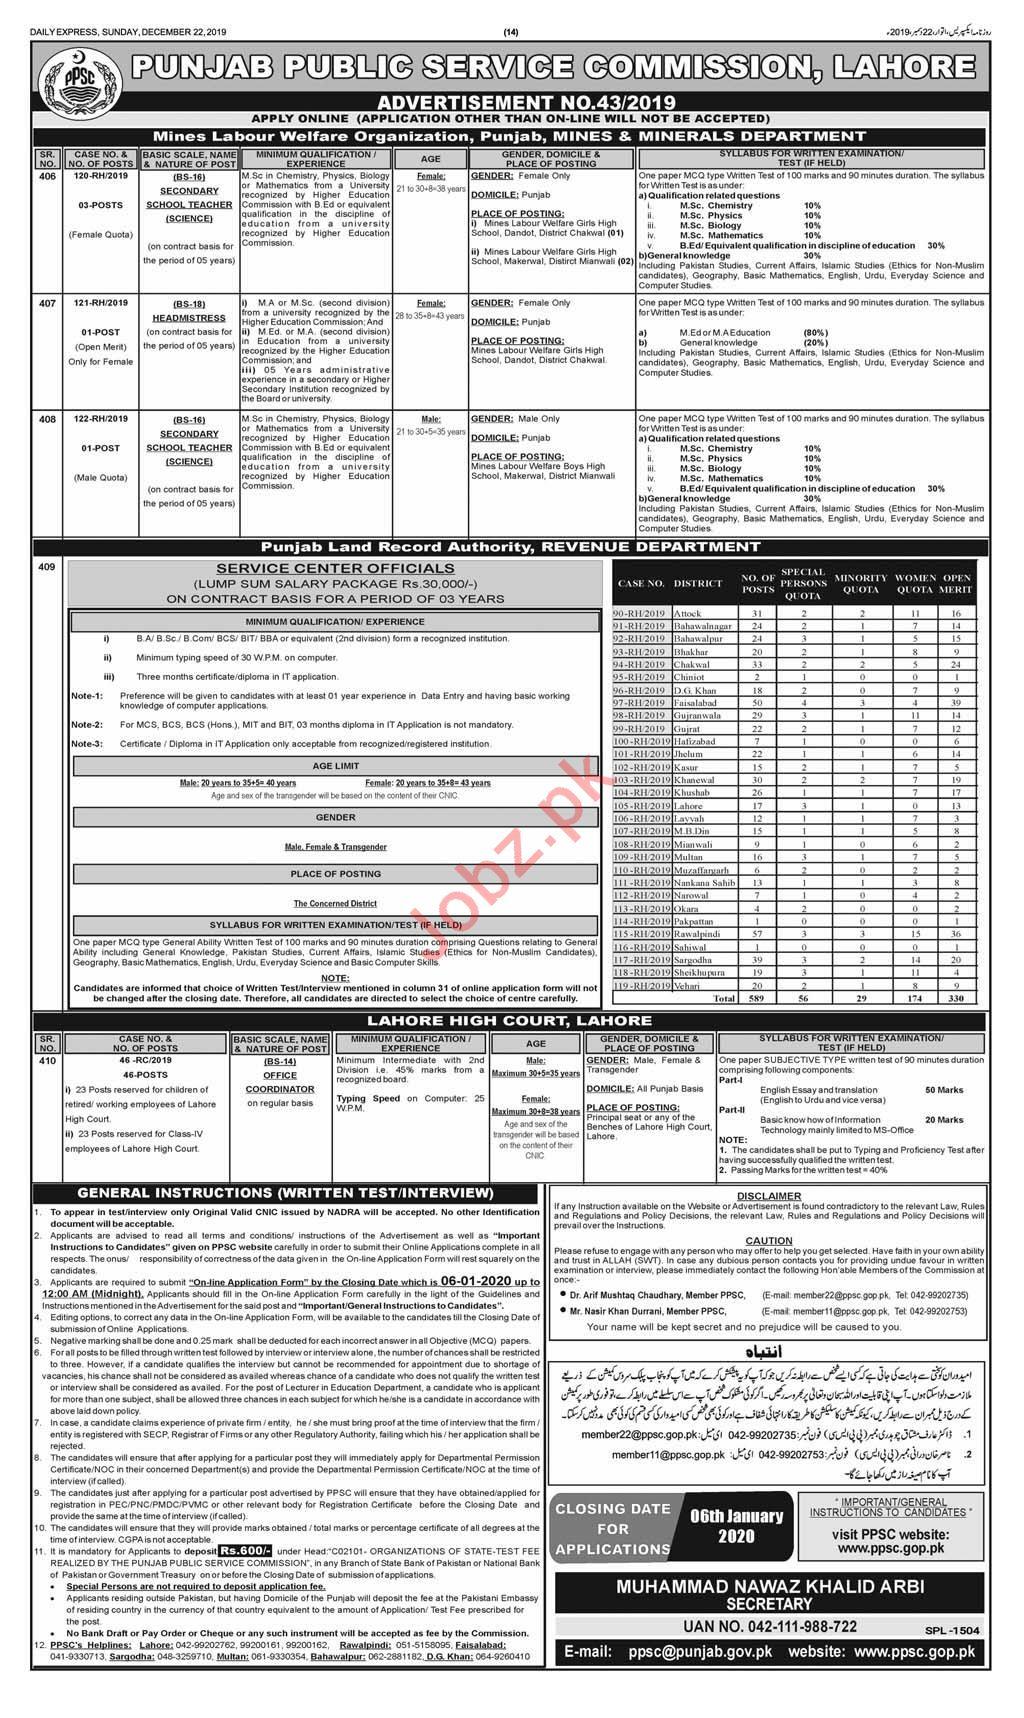 PPSC Jobs Advertisement 2020 in Lahore